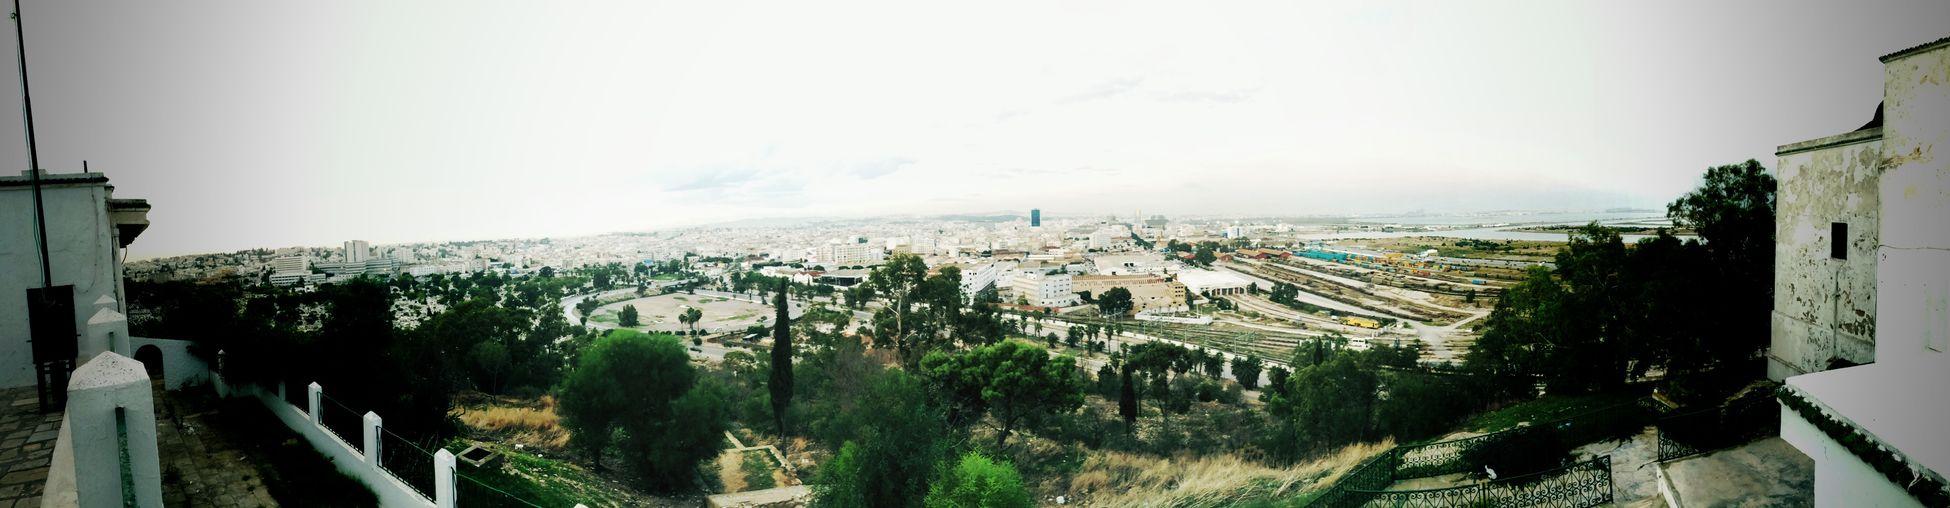 Tunisia Tunis City Panoramic Panoramic Photography Panoramic View IPhone Picture